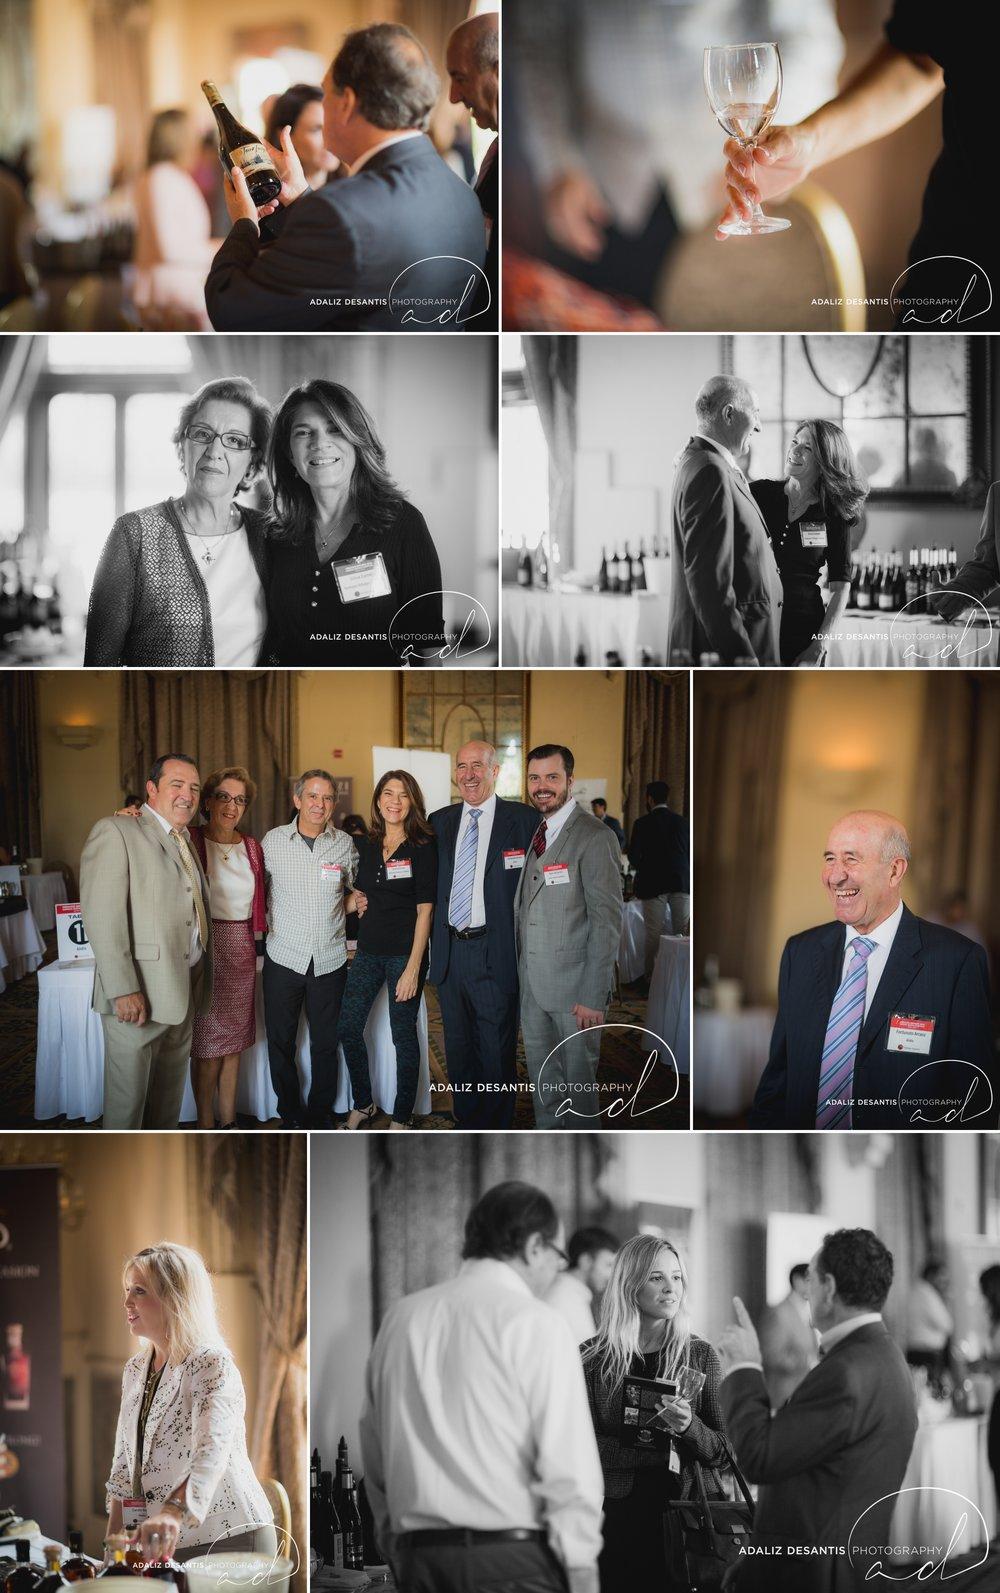 hidalgo imports anniversary wine spirits tasting biltmore hotel coral gables florida miami 2.jpg